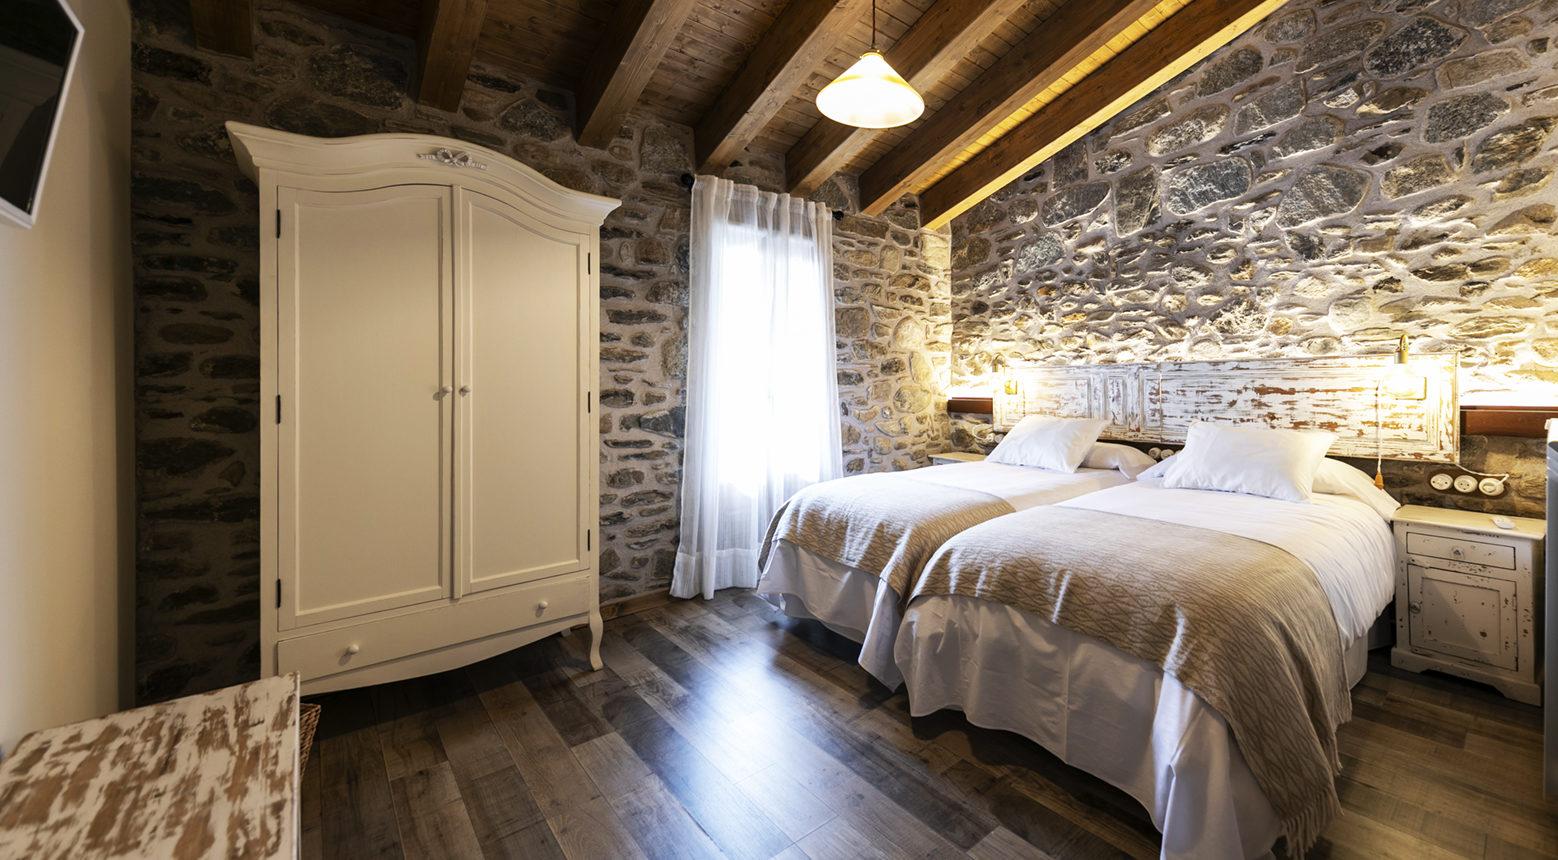 habitación doble con baño13